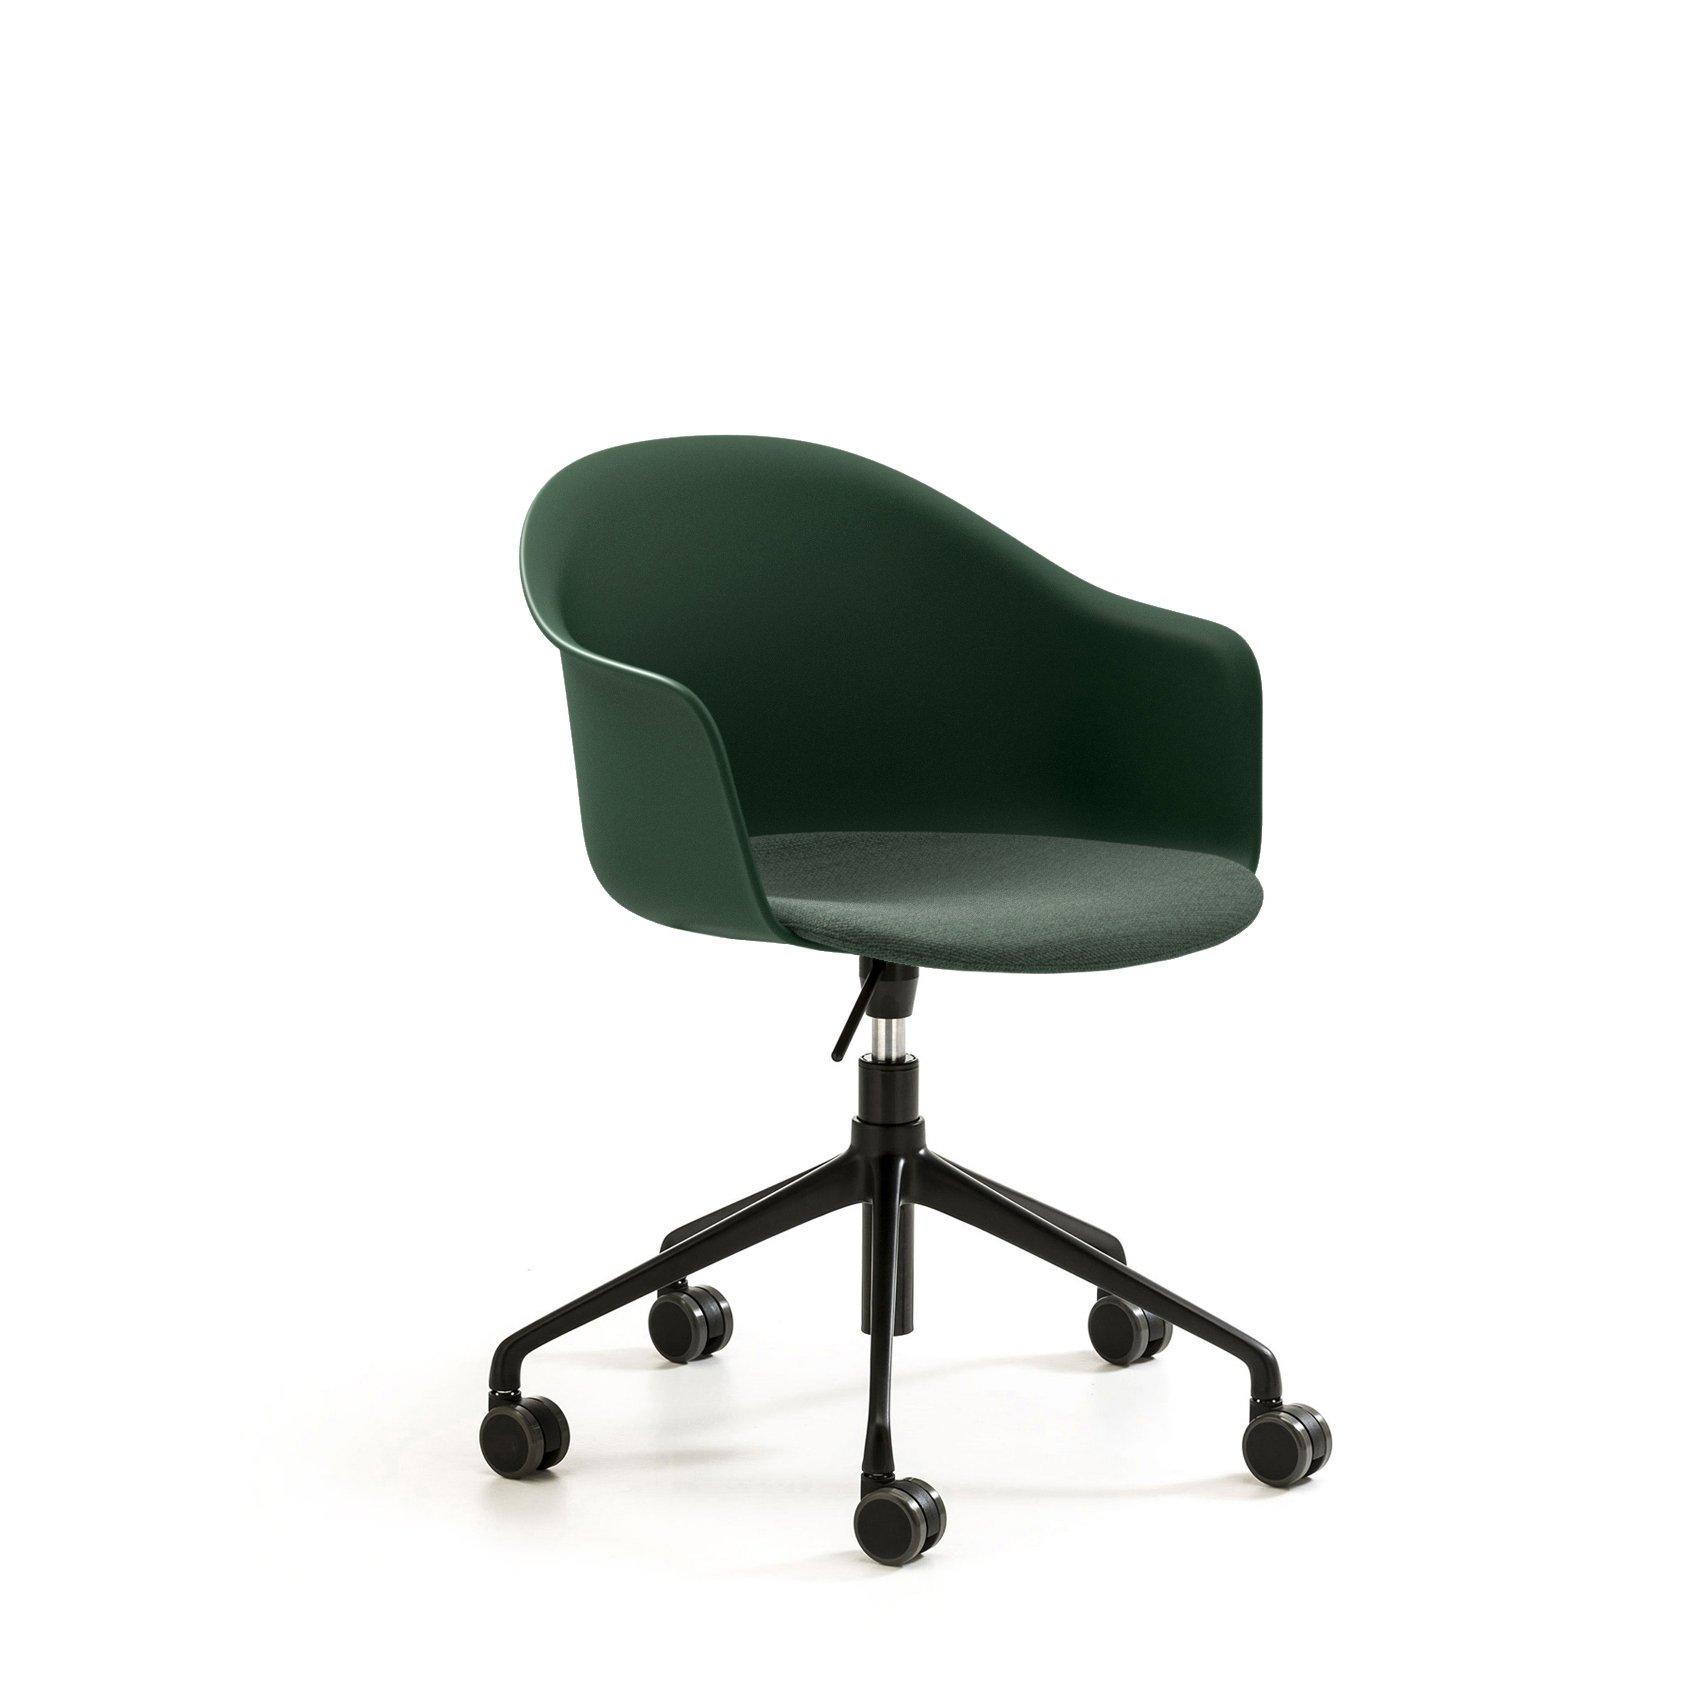 Mani Armshell HO Swivel Armchair office from Arrmet, designed by Welling/Ludvik